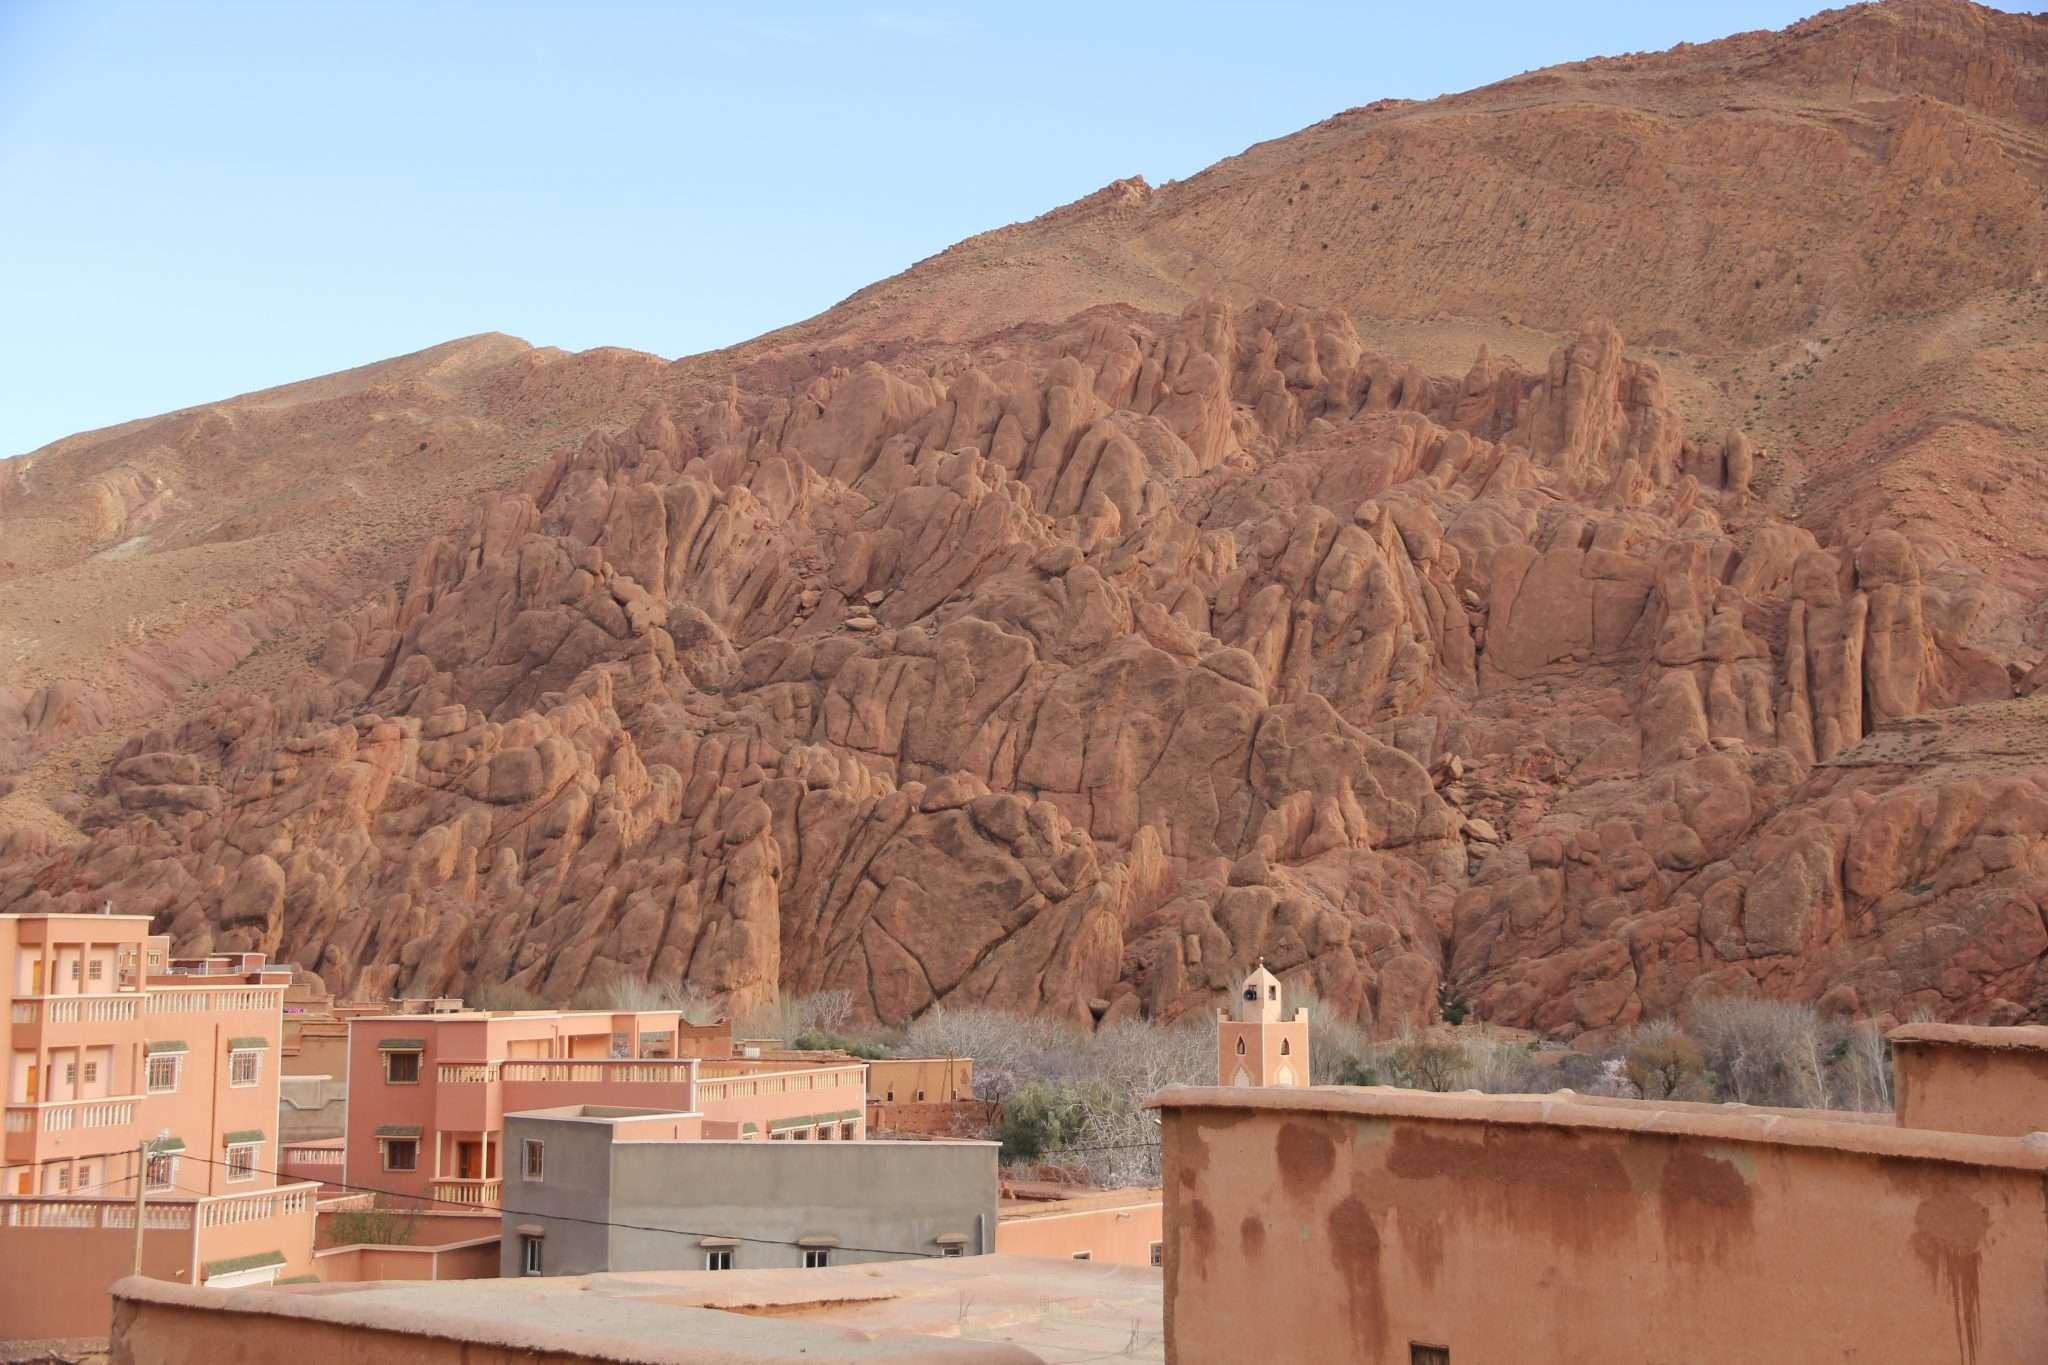 Tour from Marrakech to Sahara